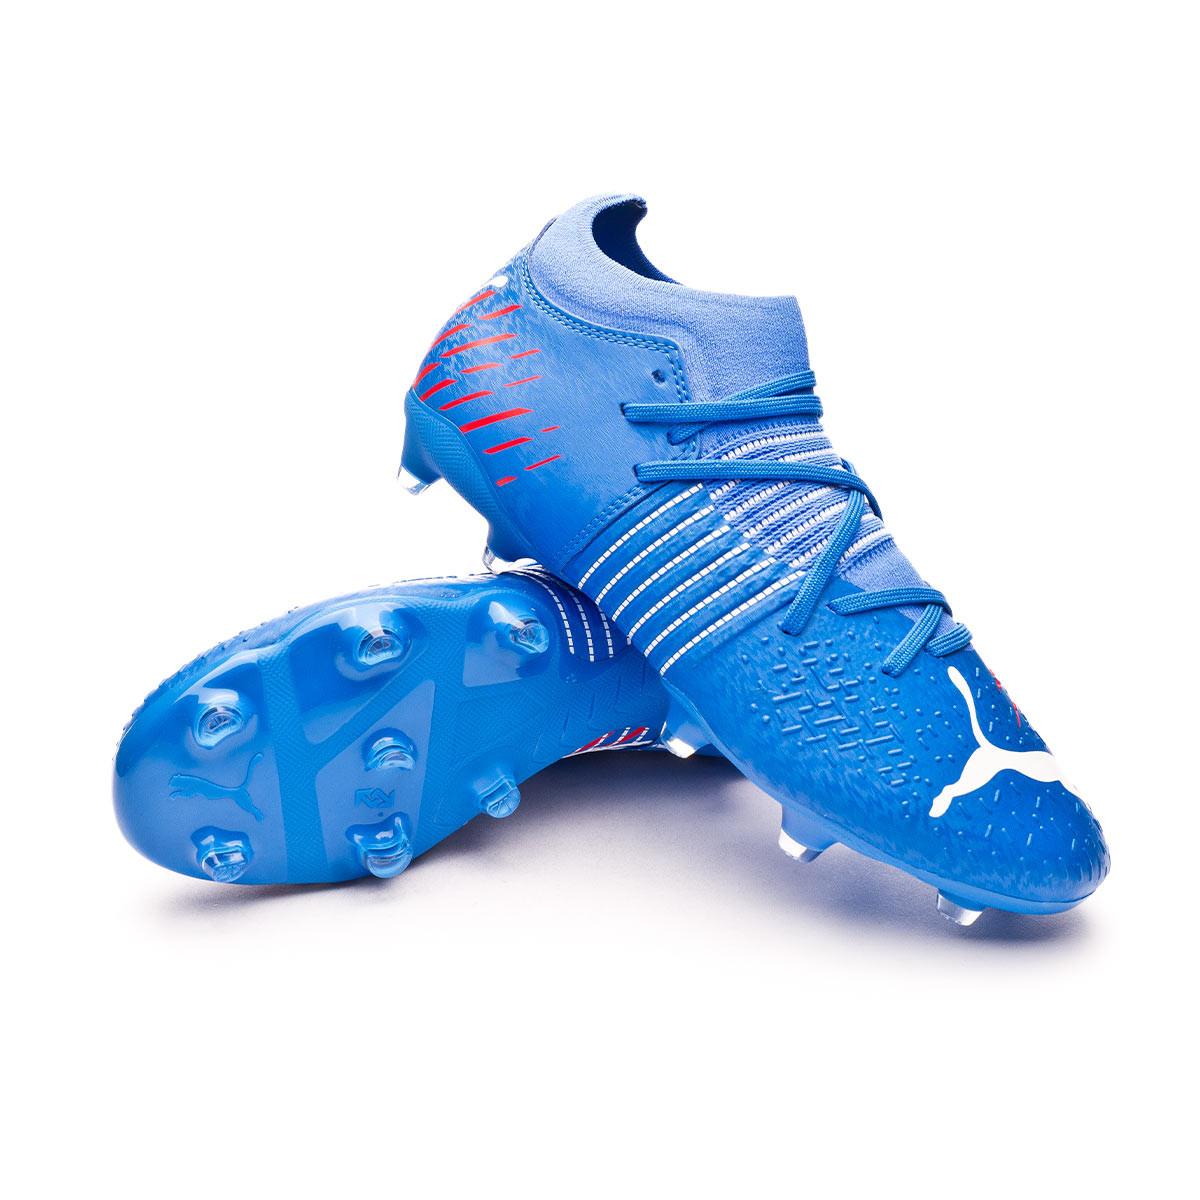 Puma Future Z 3.2 FG/AG Football Boots